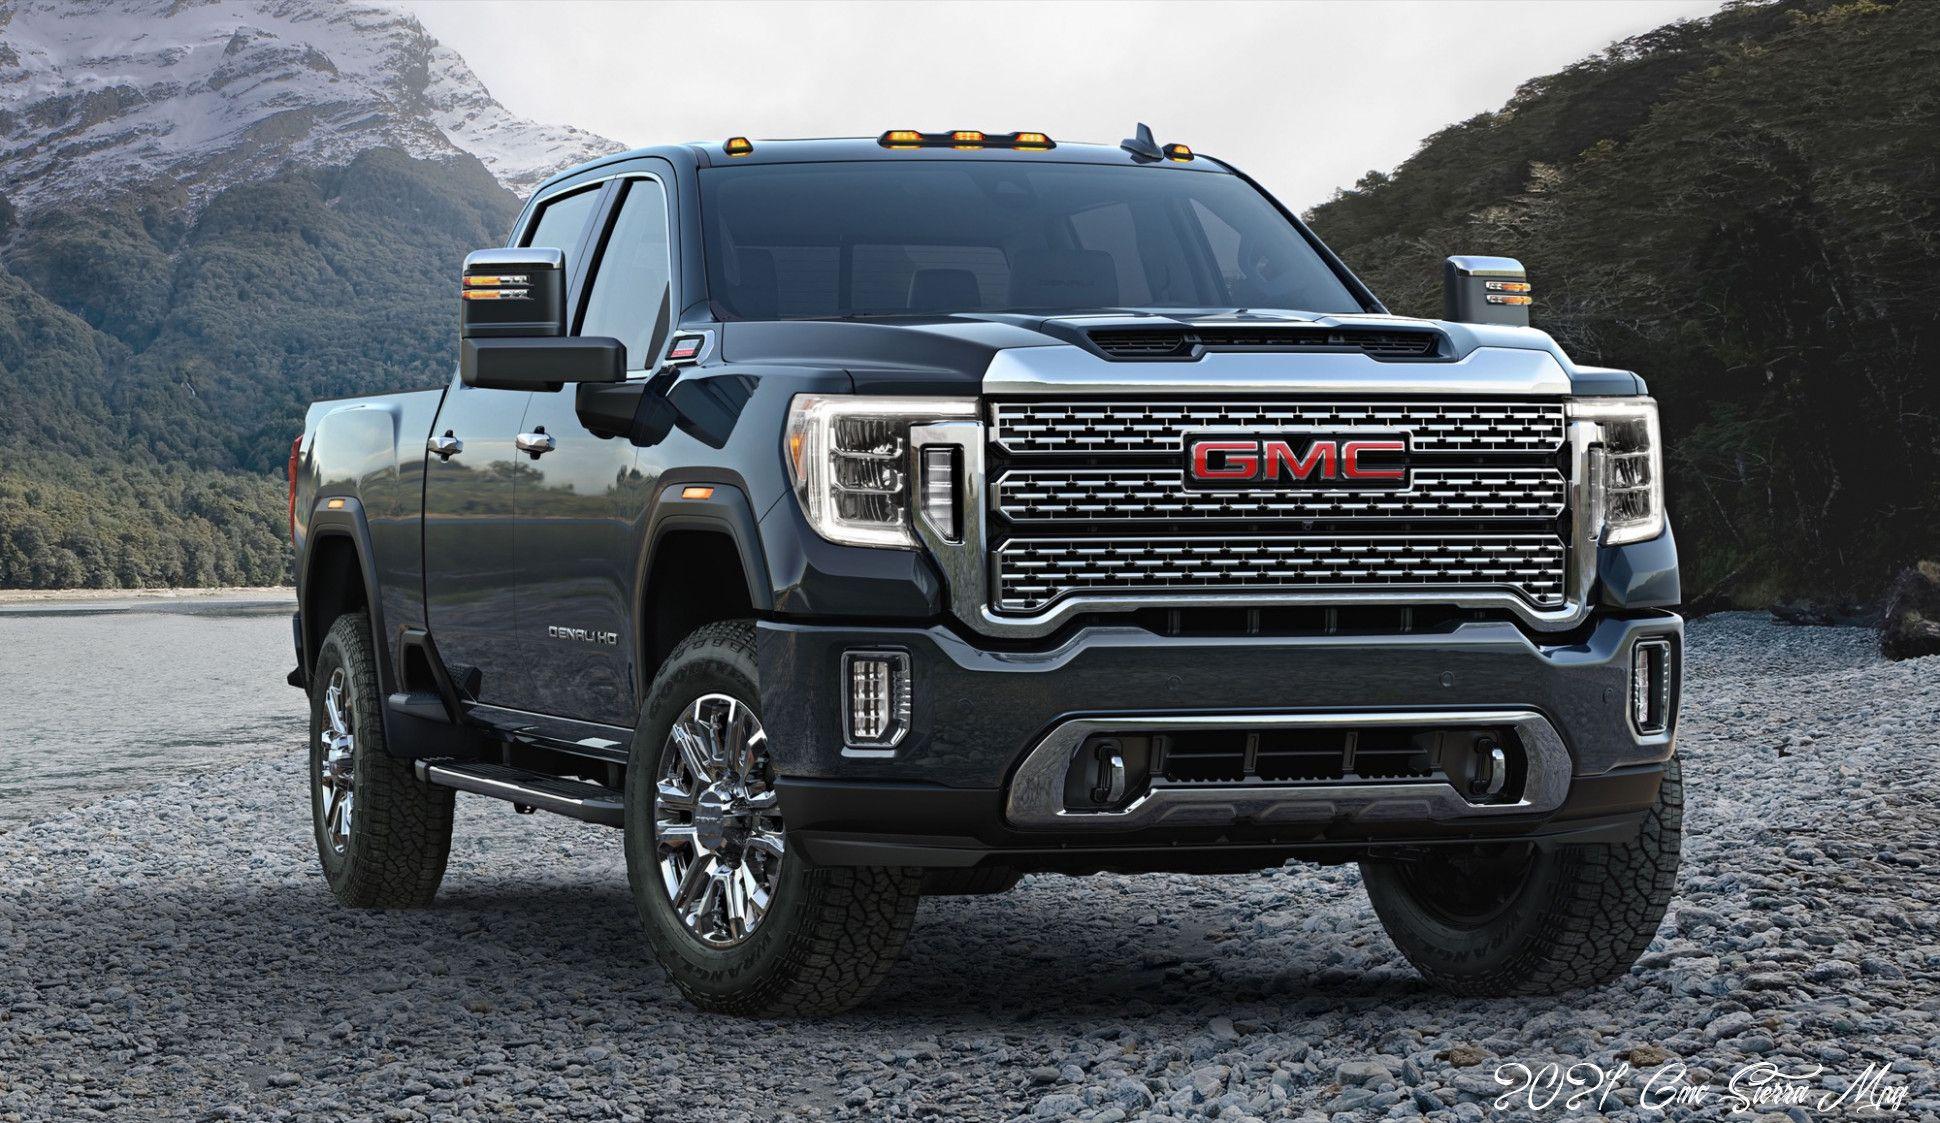 2021 Gmc Sierra Mpg Ratings In 2020 Gmc Denali Gmc Sierra Gmc Pickup